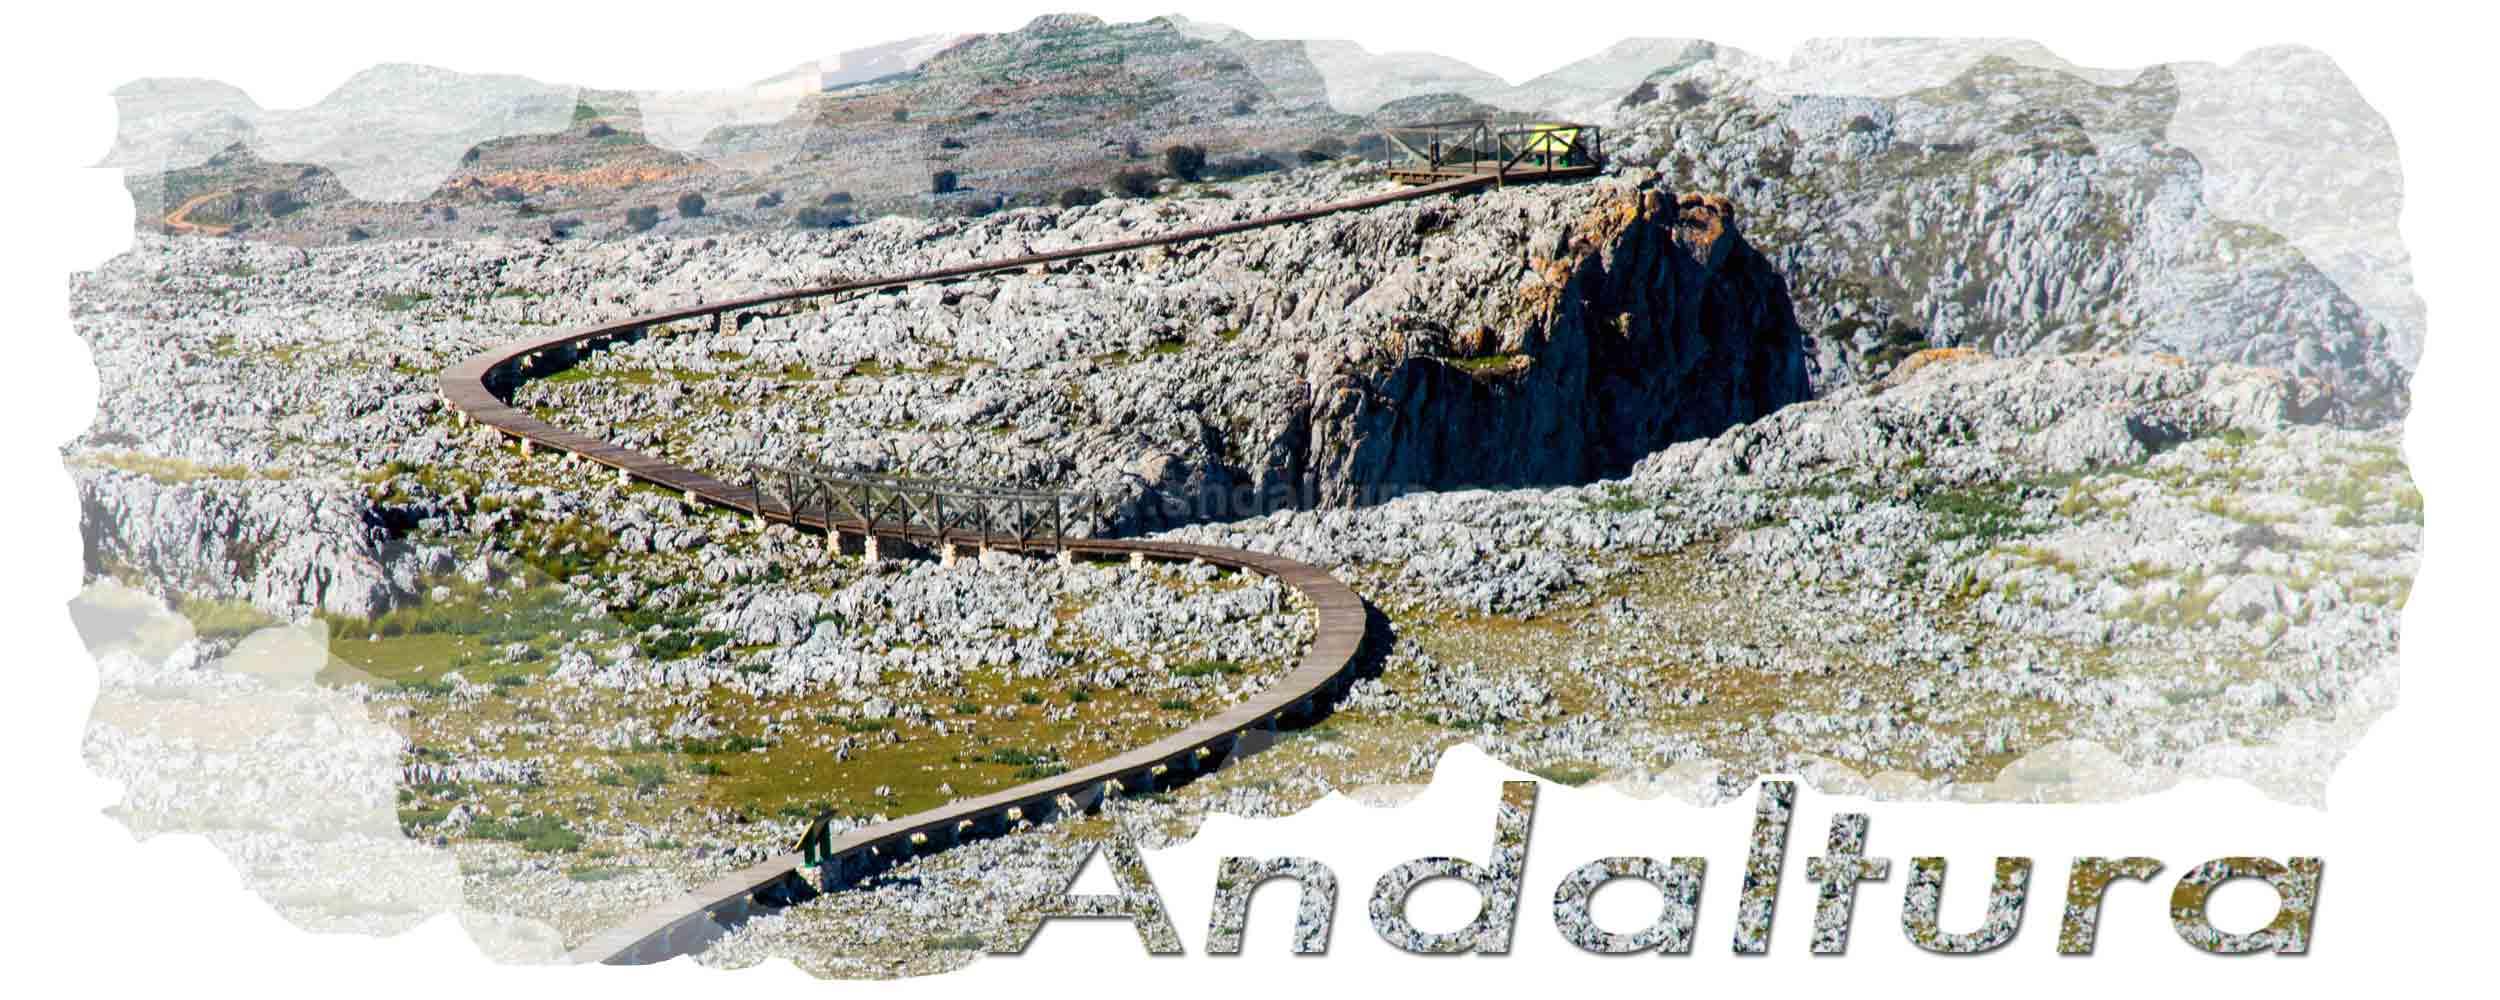 Cabecera plagio ruta GR7 de Trevélez a Juviles. Sierra de Loja